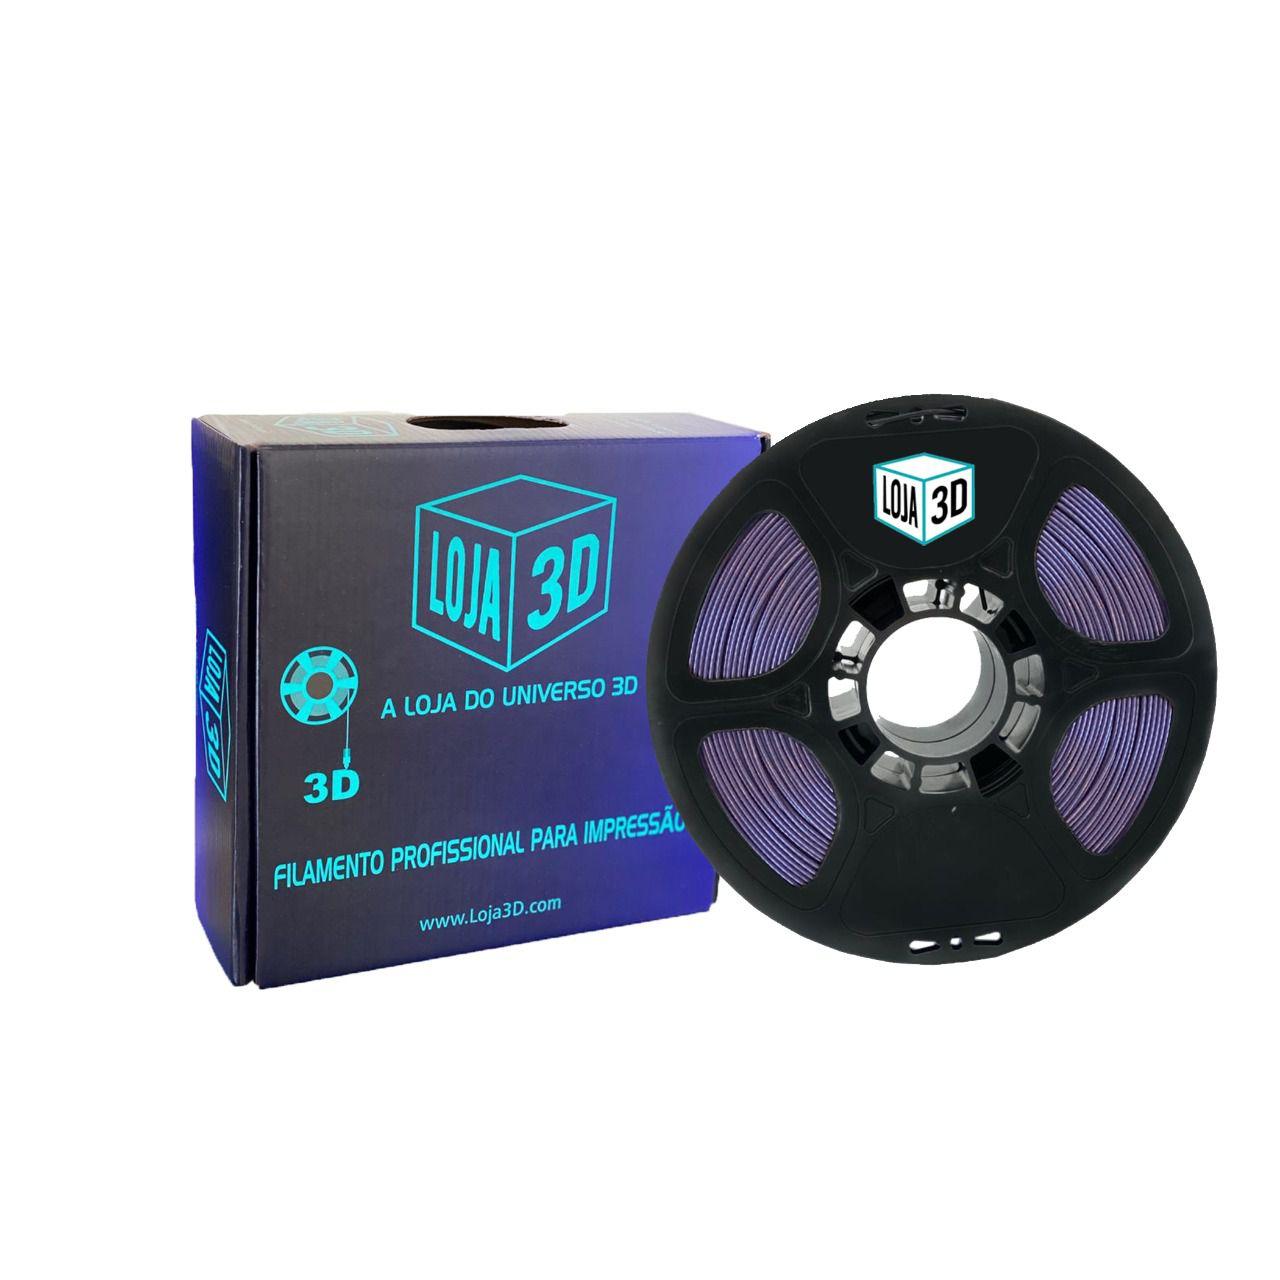 Filamento PLA Pro - Roxo - Loja 3D - 1.75mm - 1kg